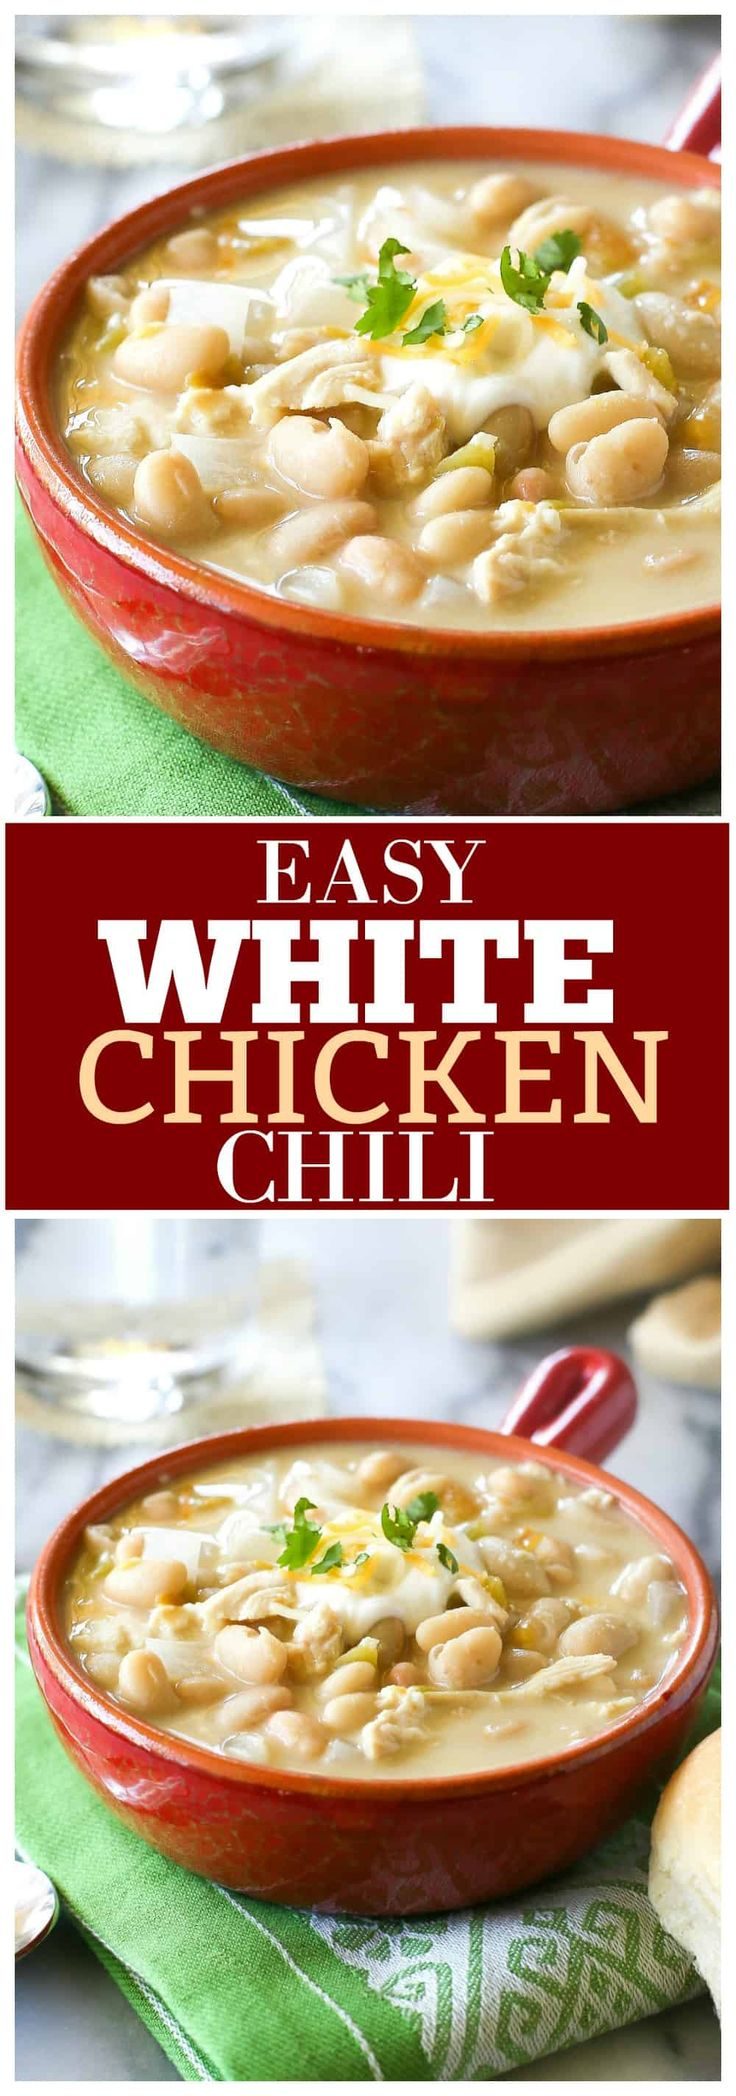 Mom's White Chicken Chili